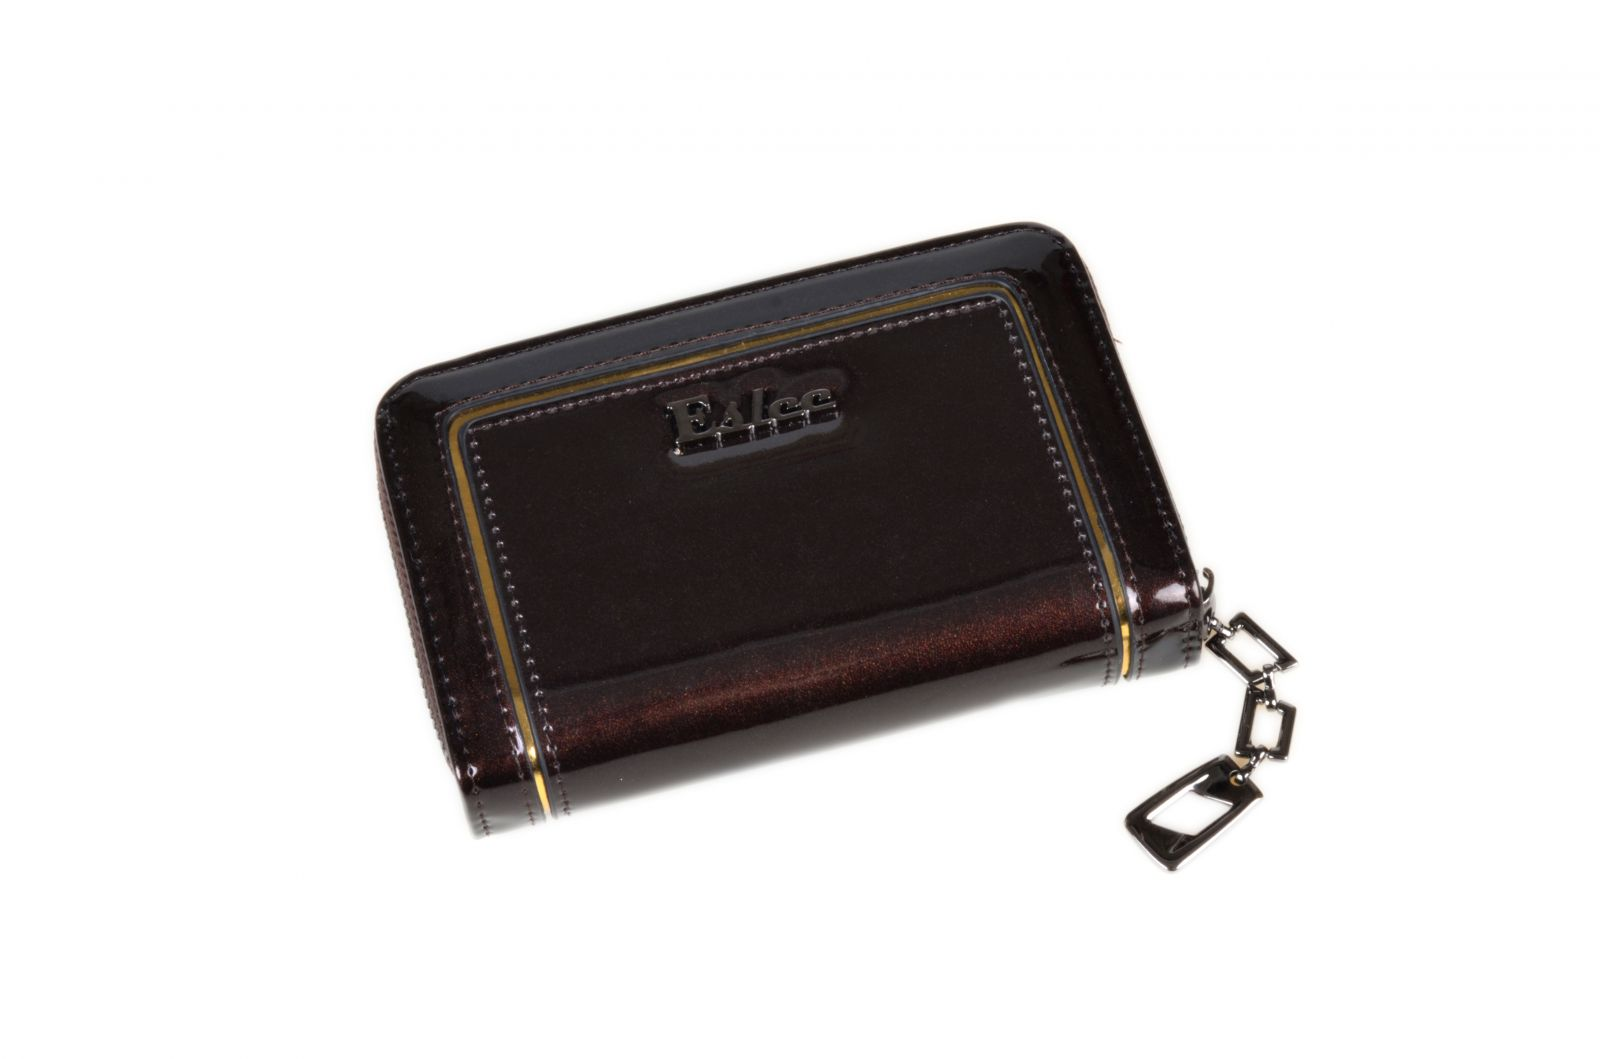 Dámská peněženka malá ESLEE F6873 coffee E-batoh